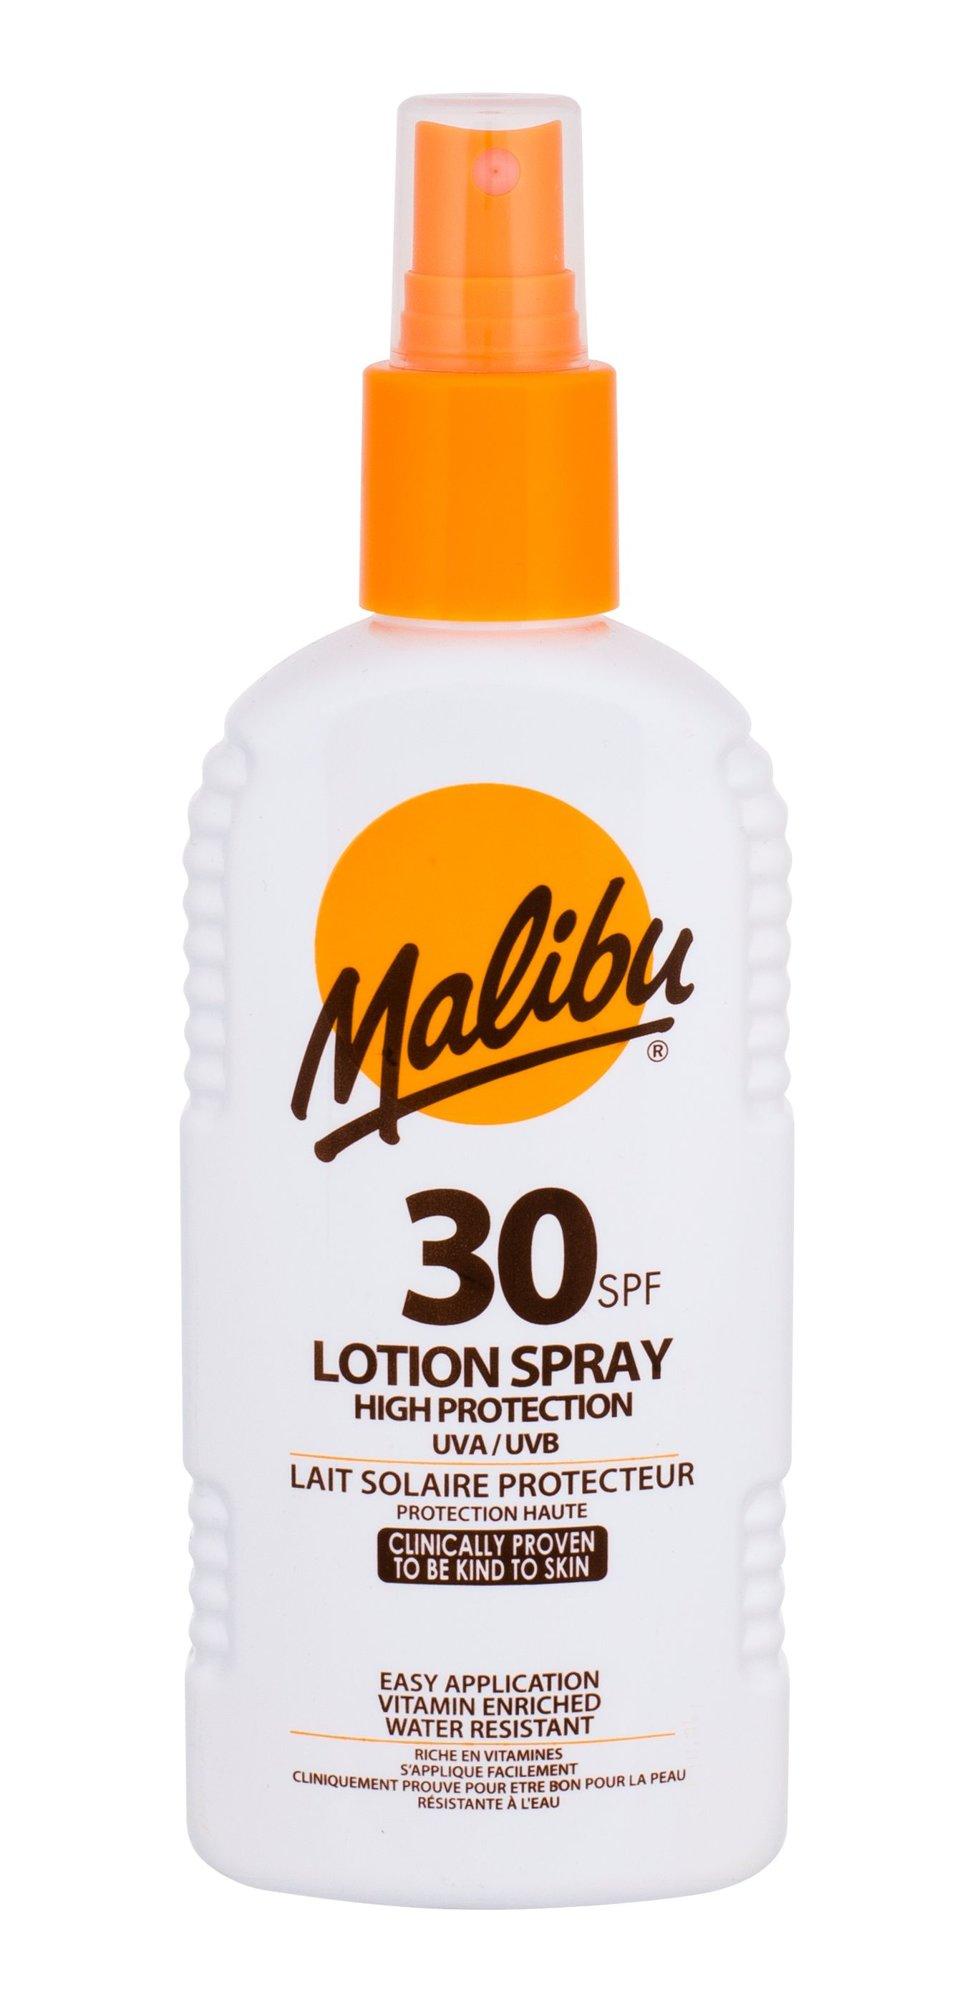 Malibu Lotion Spray SPF30